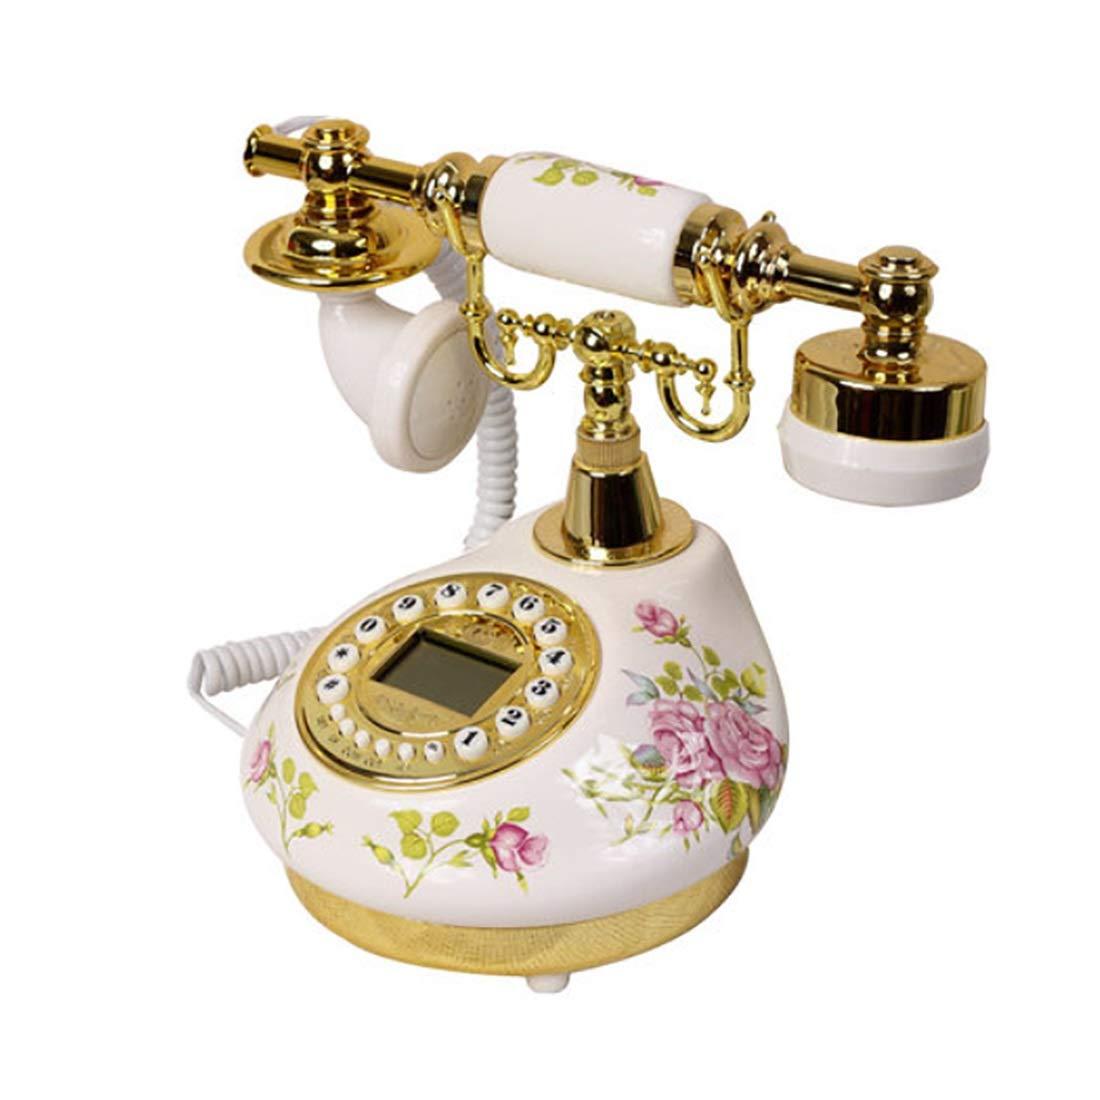 Fashion Home ZHILIAN Retro European Style Rustic Telephone Landline Golden Family Living Room Decoration Telephone Wired Telephone